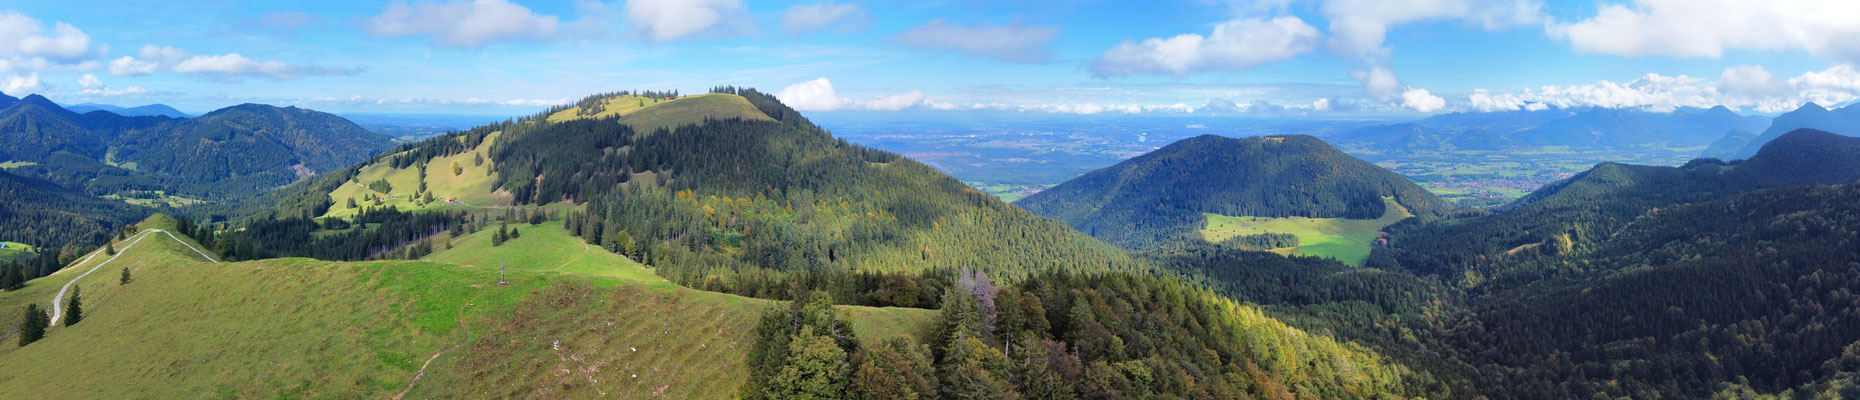 Panorama - Drohnenfotografie - Berge - Alpen - Wanderung - Chiemgau - Mitterberg bei Schuhbräualm